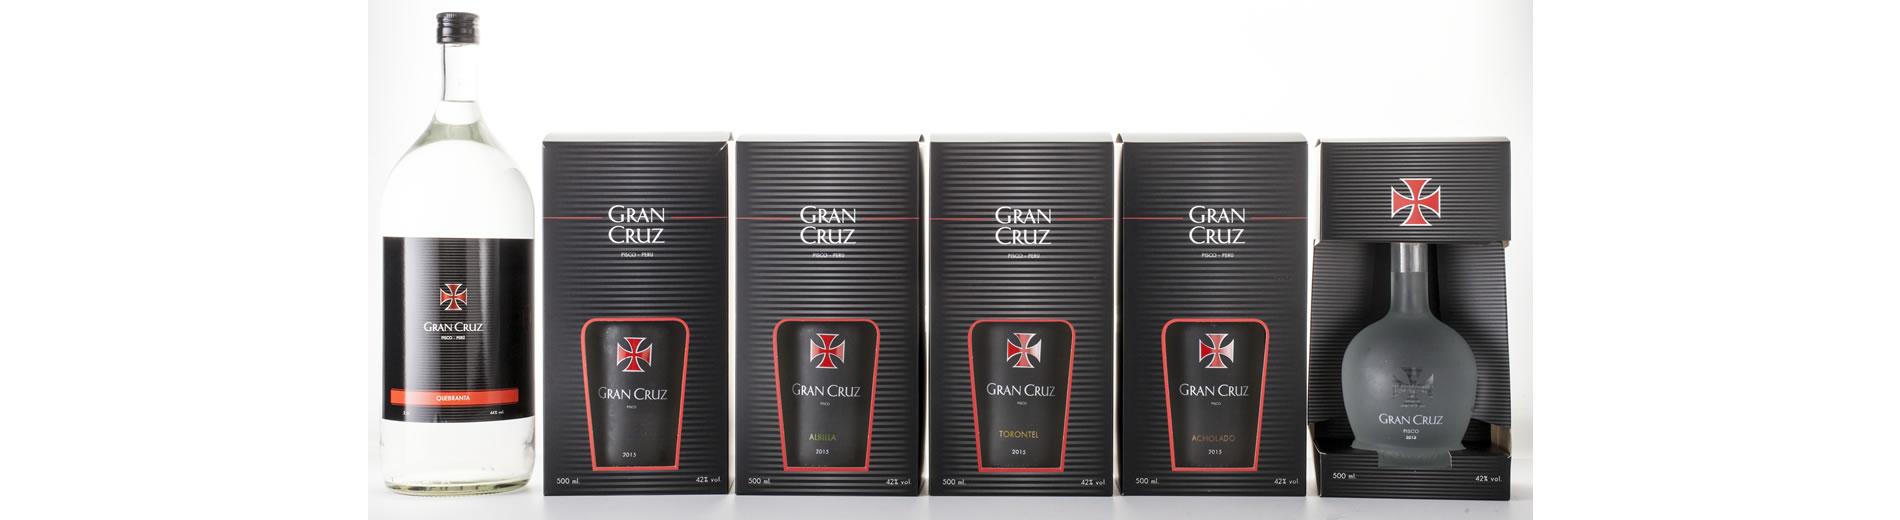 Pisco-Gran-Cruz-2017-Slider-3